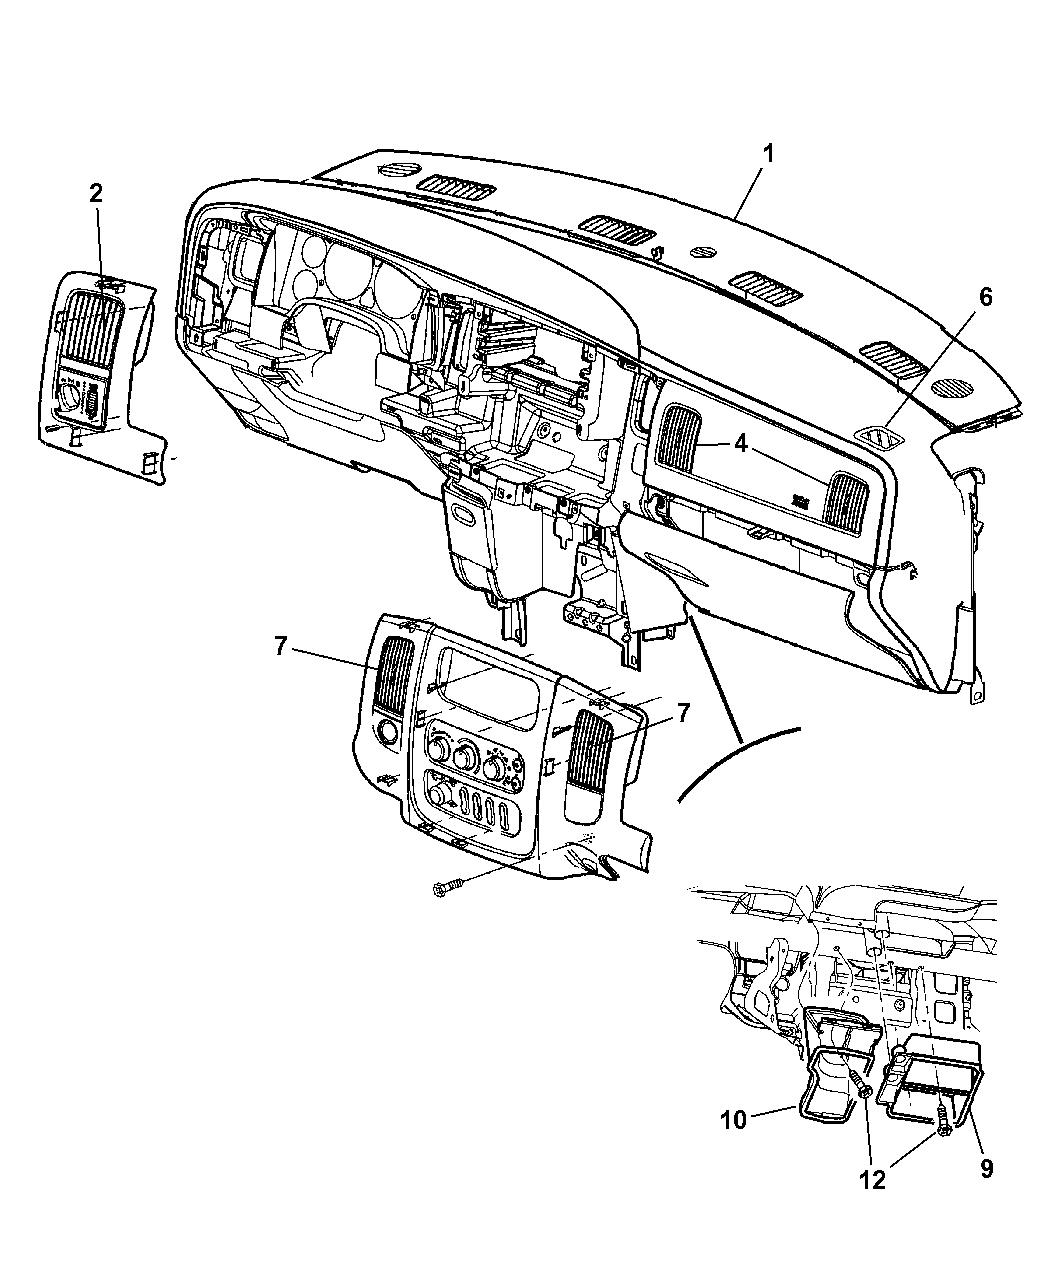 97 dodge ram 1500 wiring diagram 2003 dodge ram 1500 air ducts - mopar parts giant 97 dodge ram hvac diagram